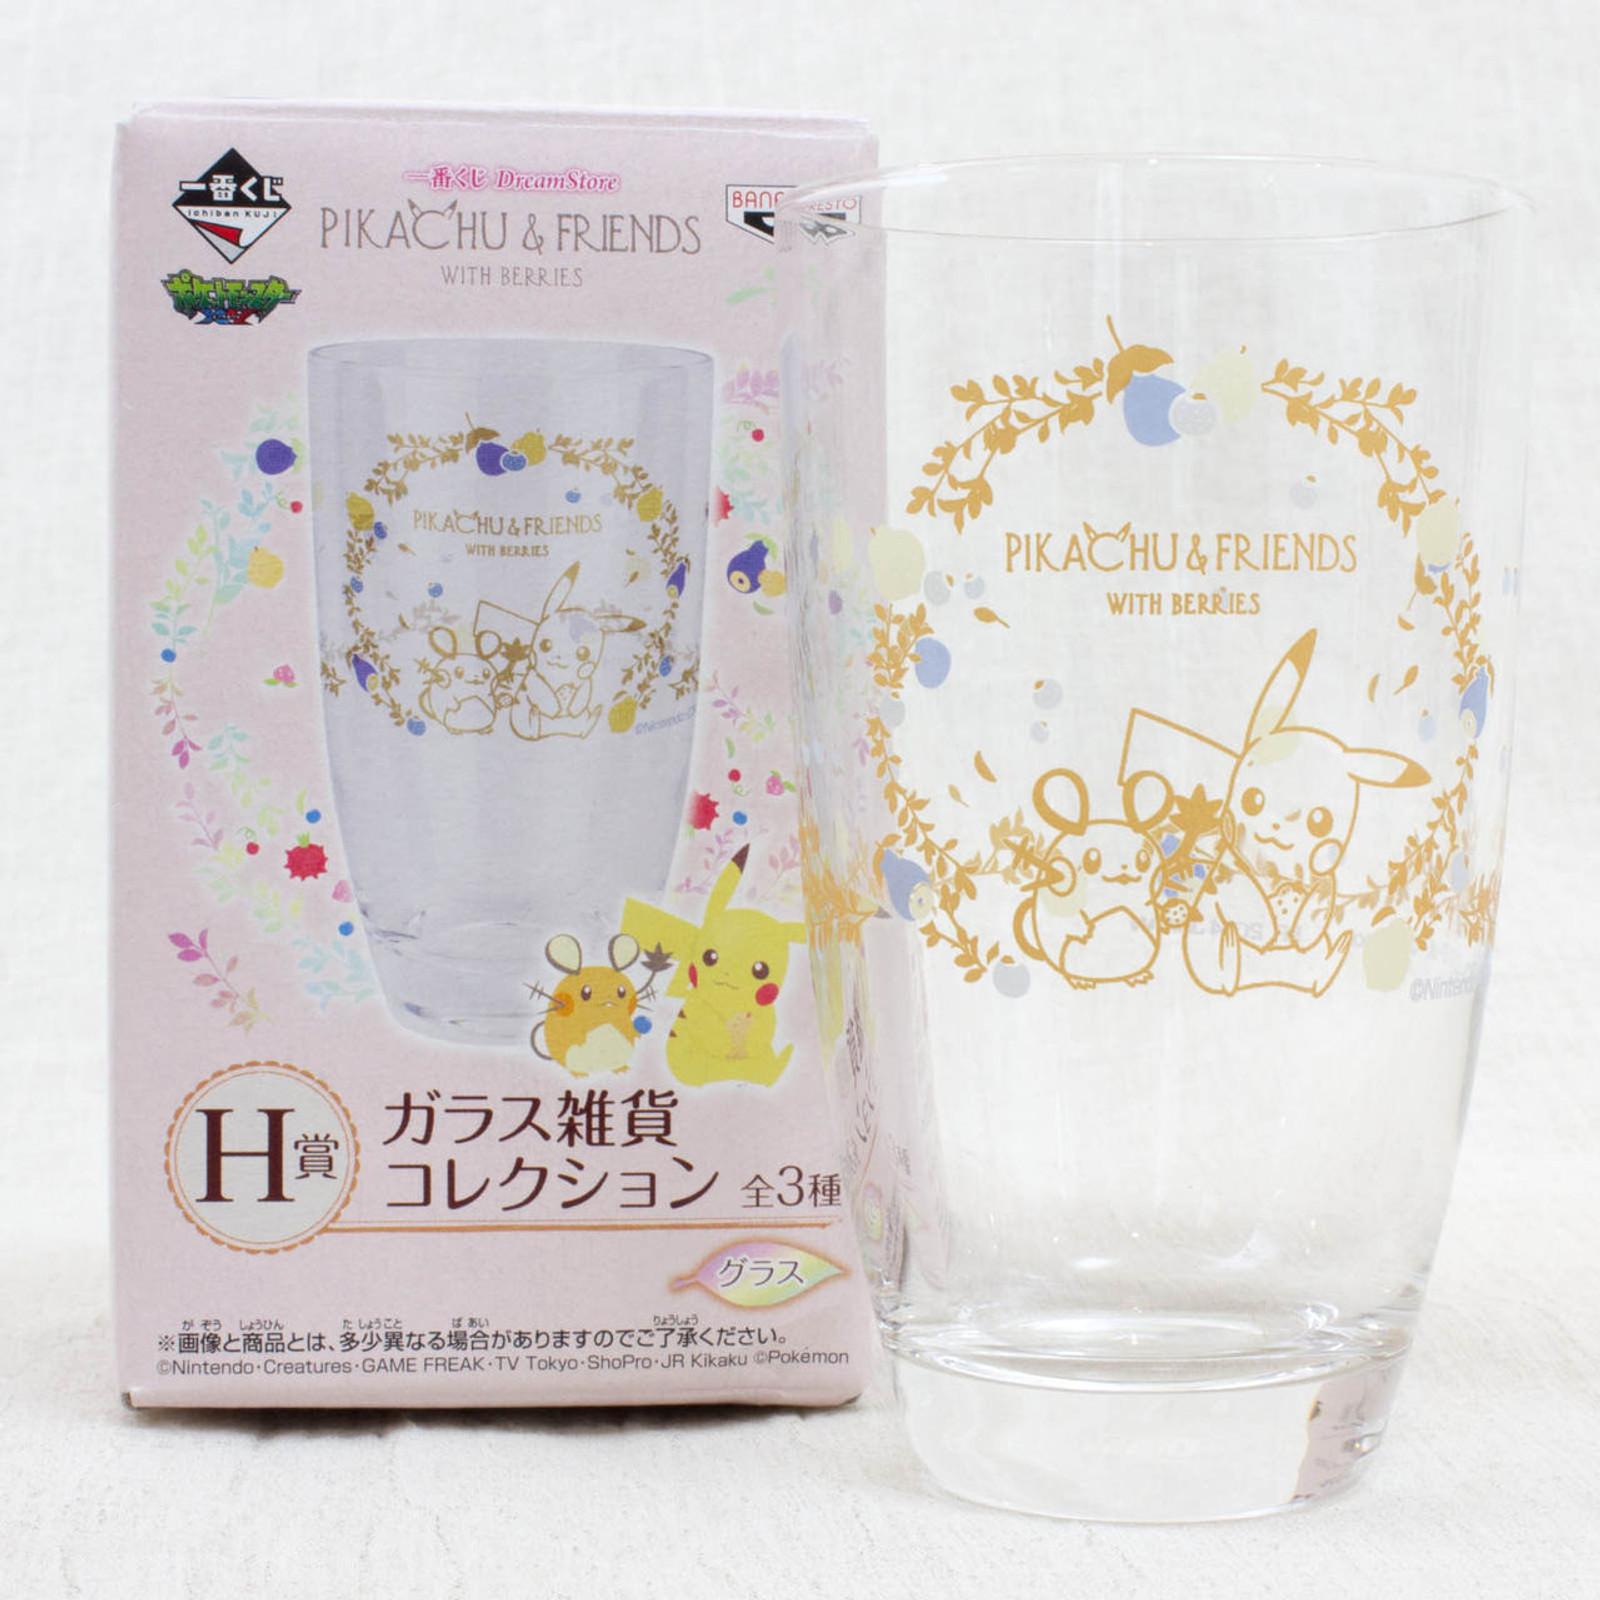 Pokemon Glass Pikachu & Friends Banpresto Pocket Monster JAPAN ANIME